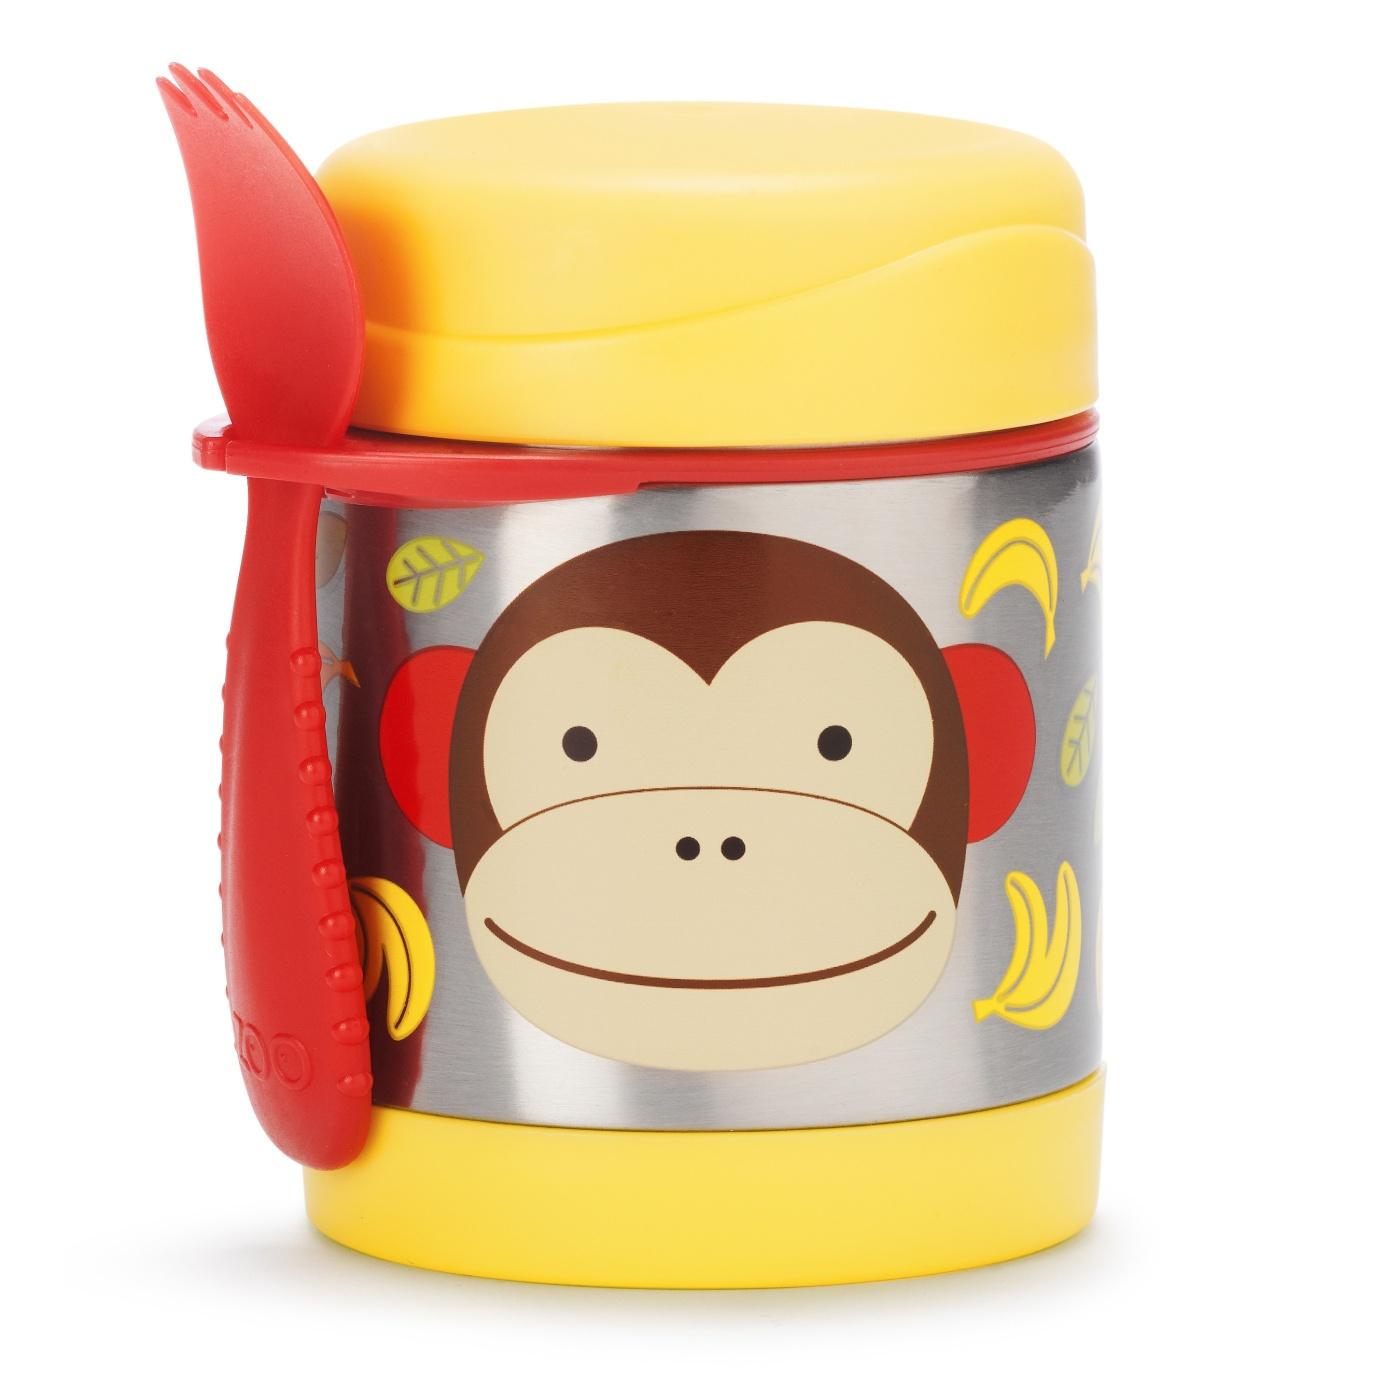 Skip Hop Zoo Termoska na jídlo s vidličkou - Opička 12m+